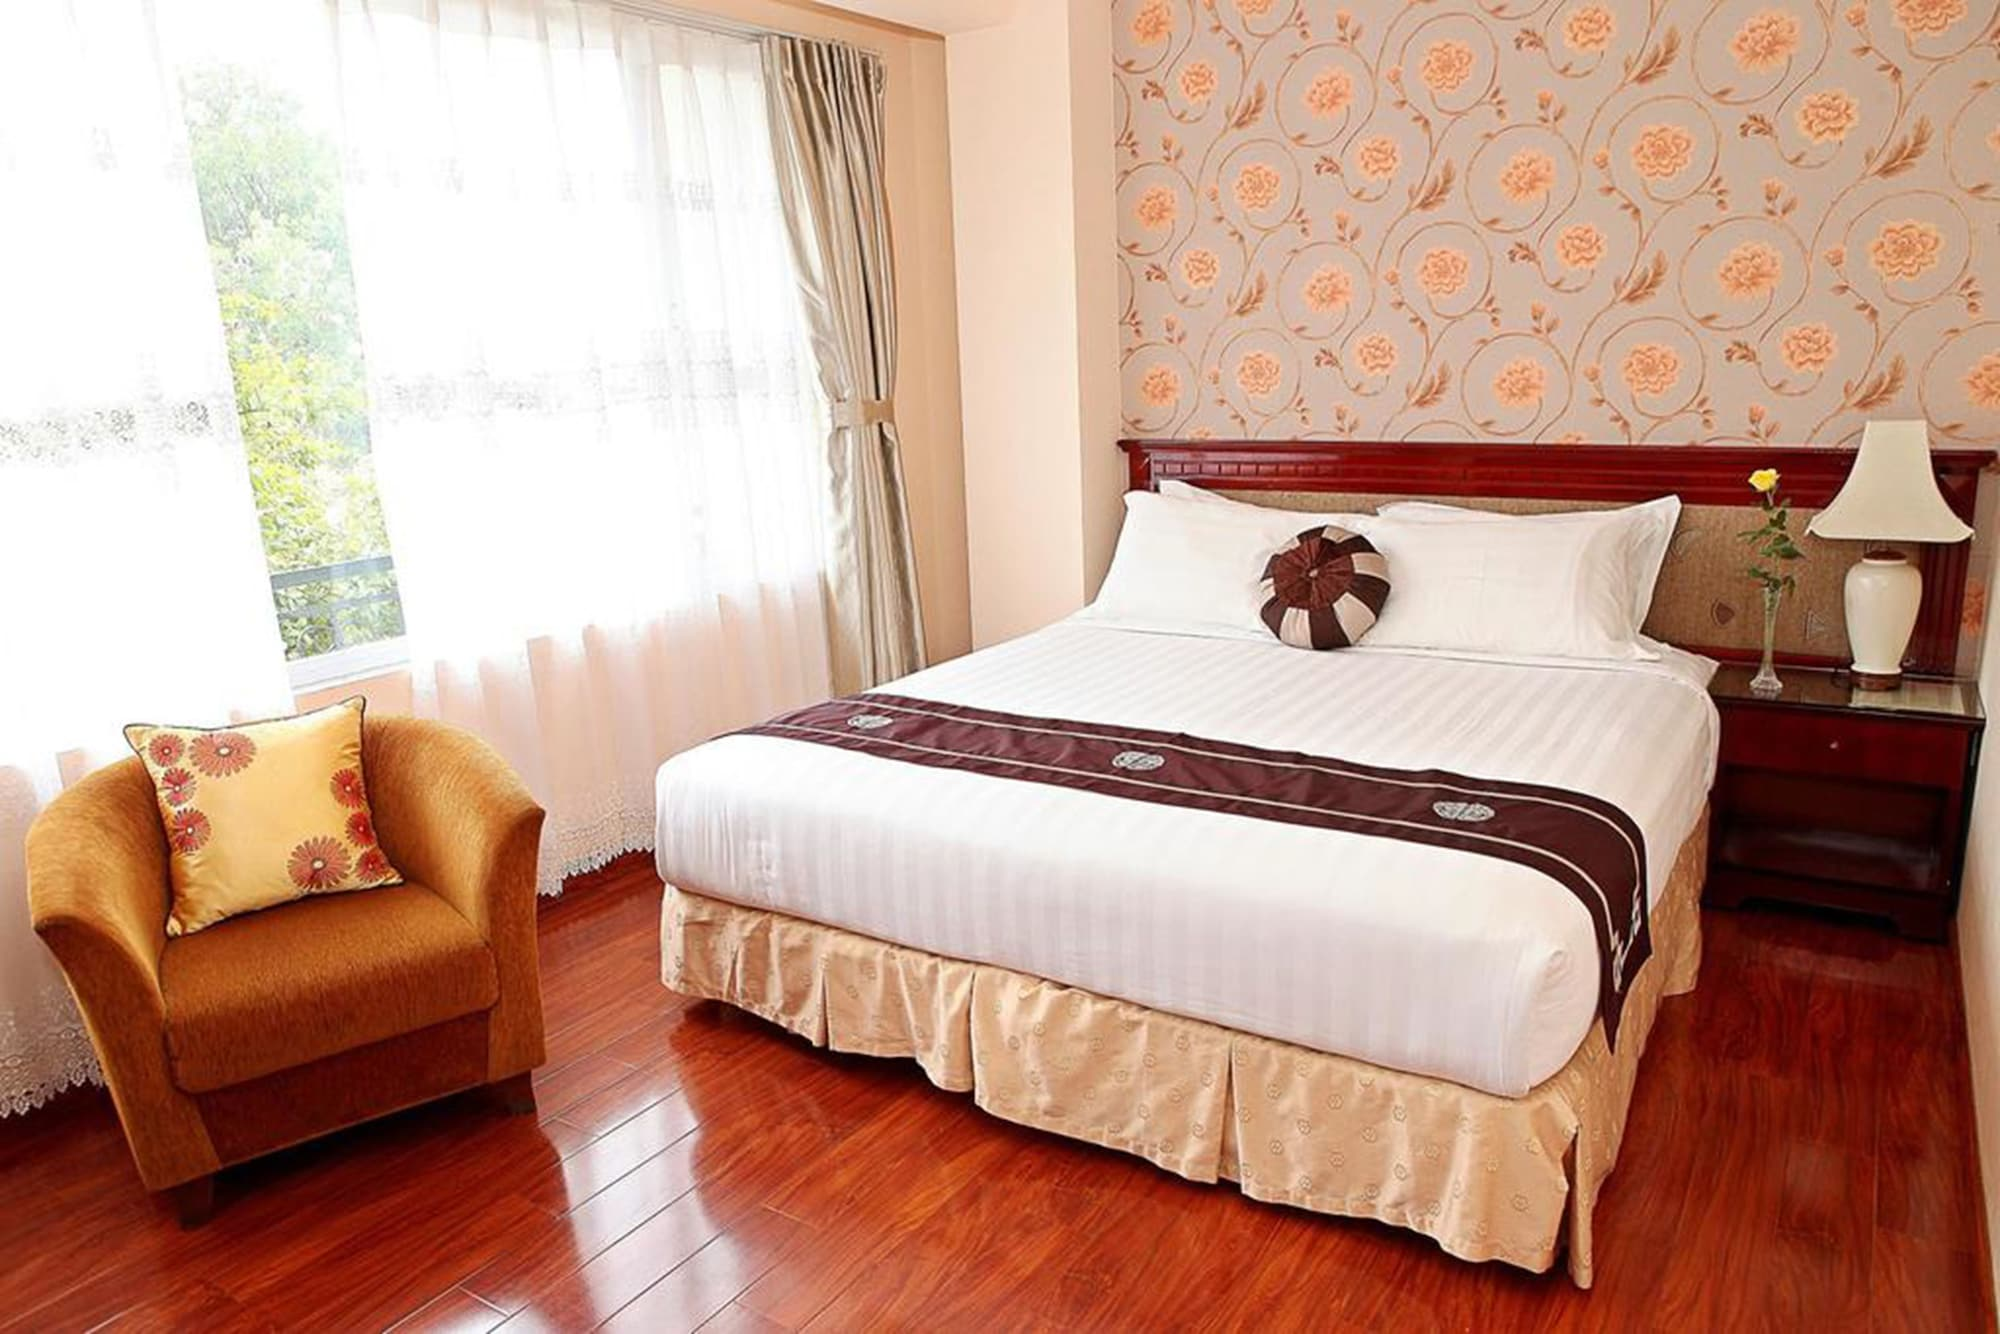 Flower Hotel, Ba Đình